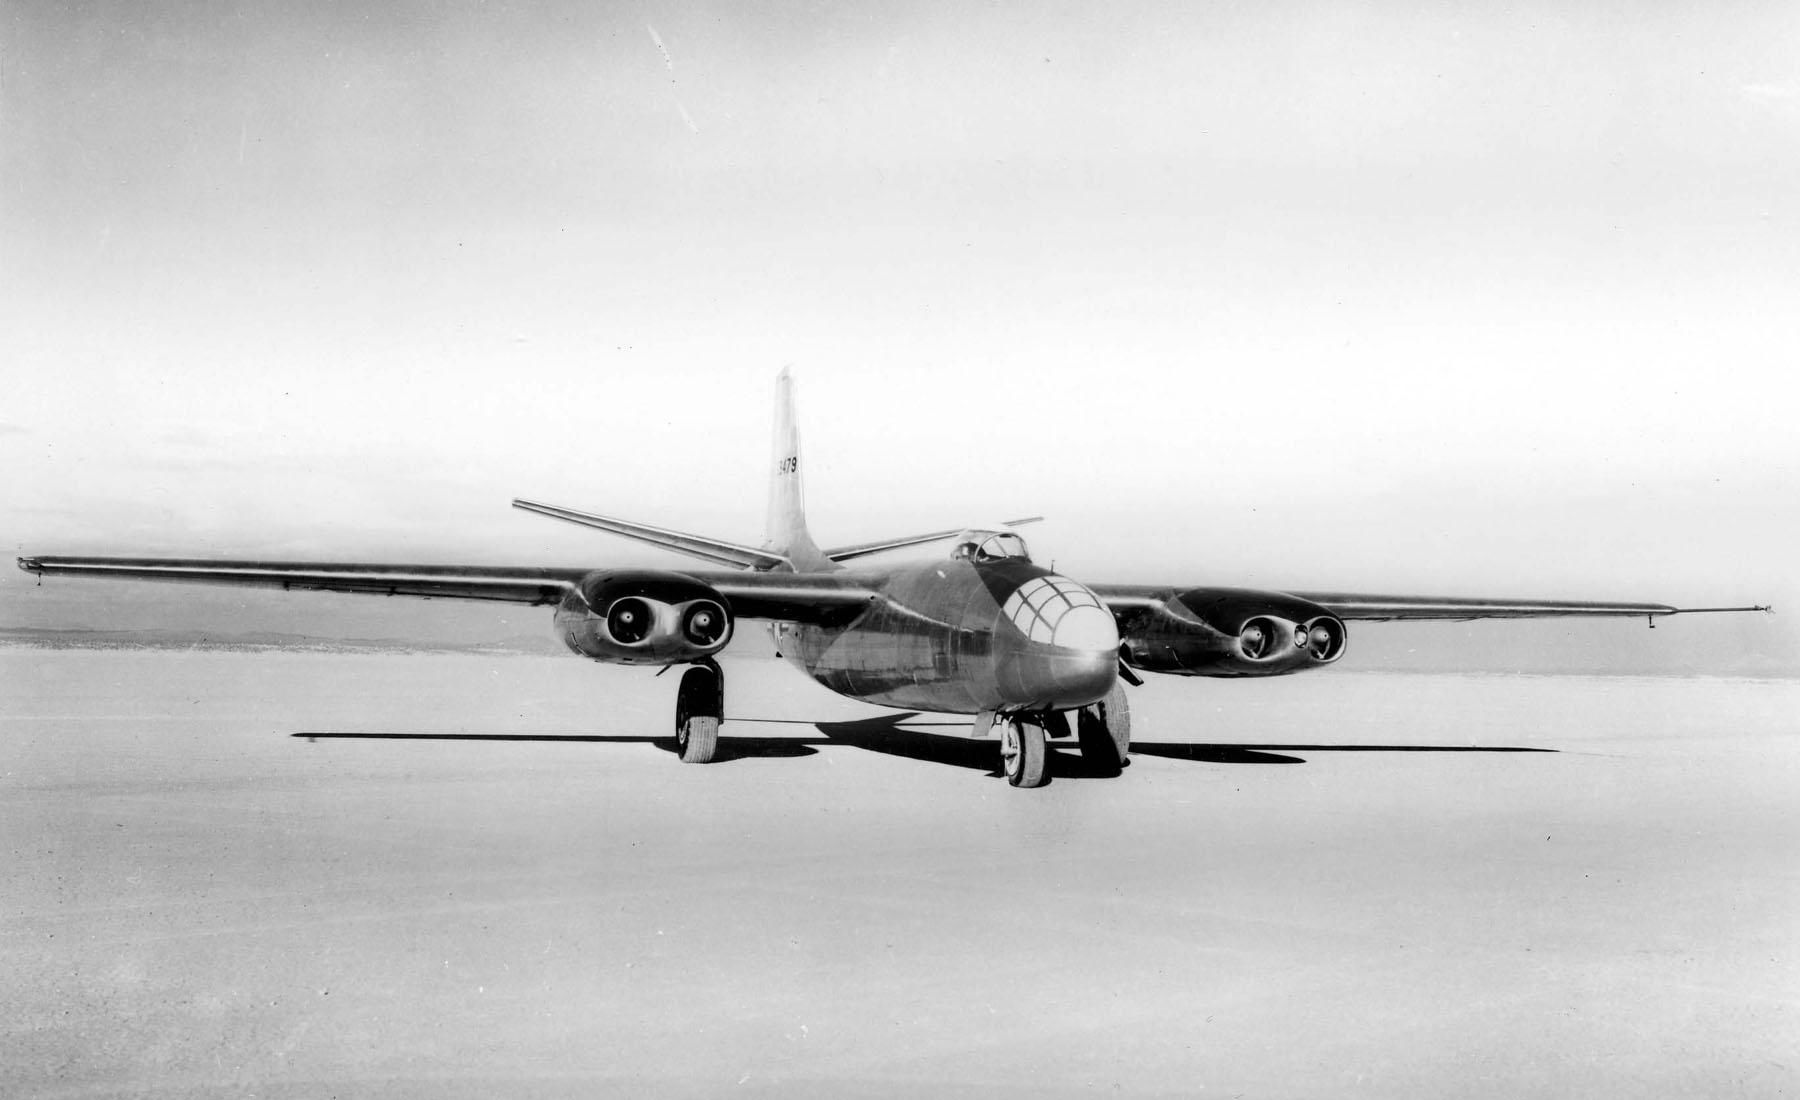 North_American_XB-45_first_061020-F-1234